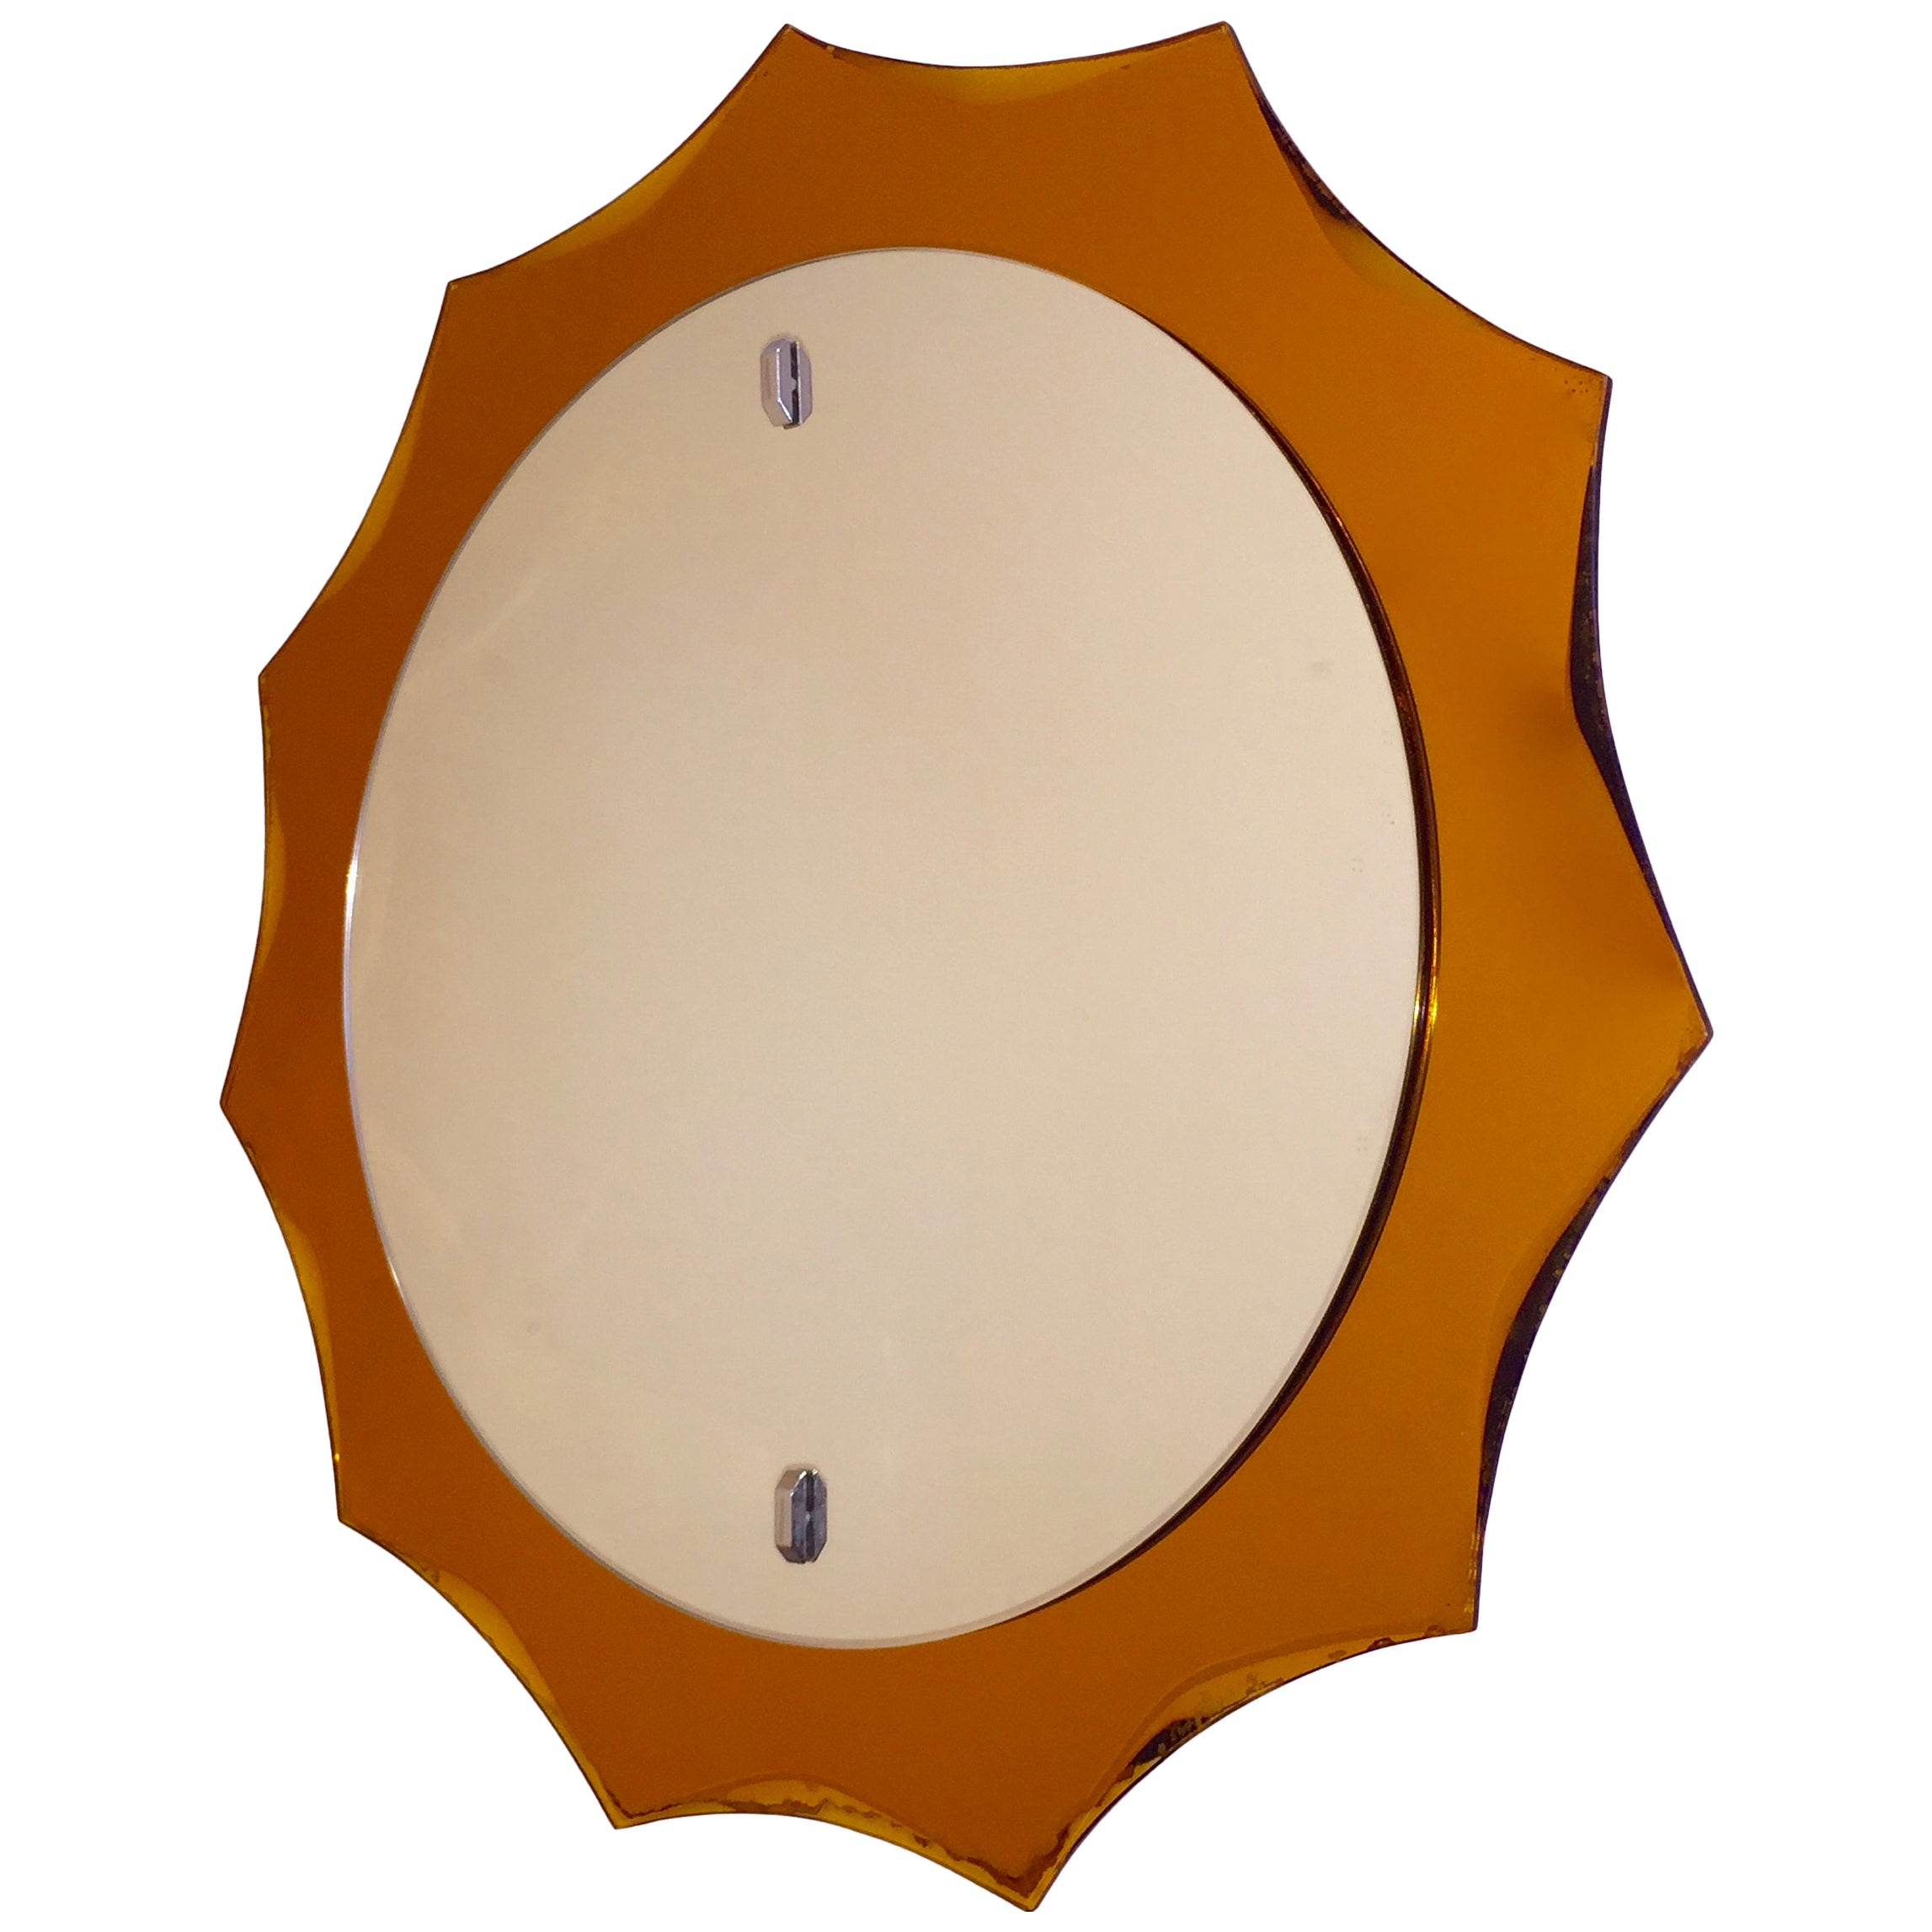 Vintage 1950s Bright Orange Italian mirror, original mid-century